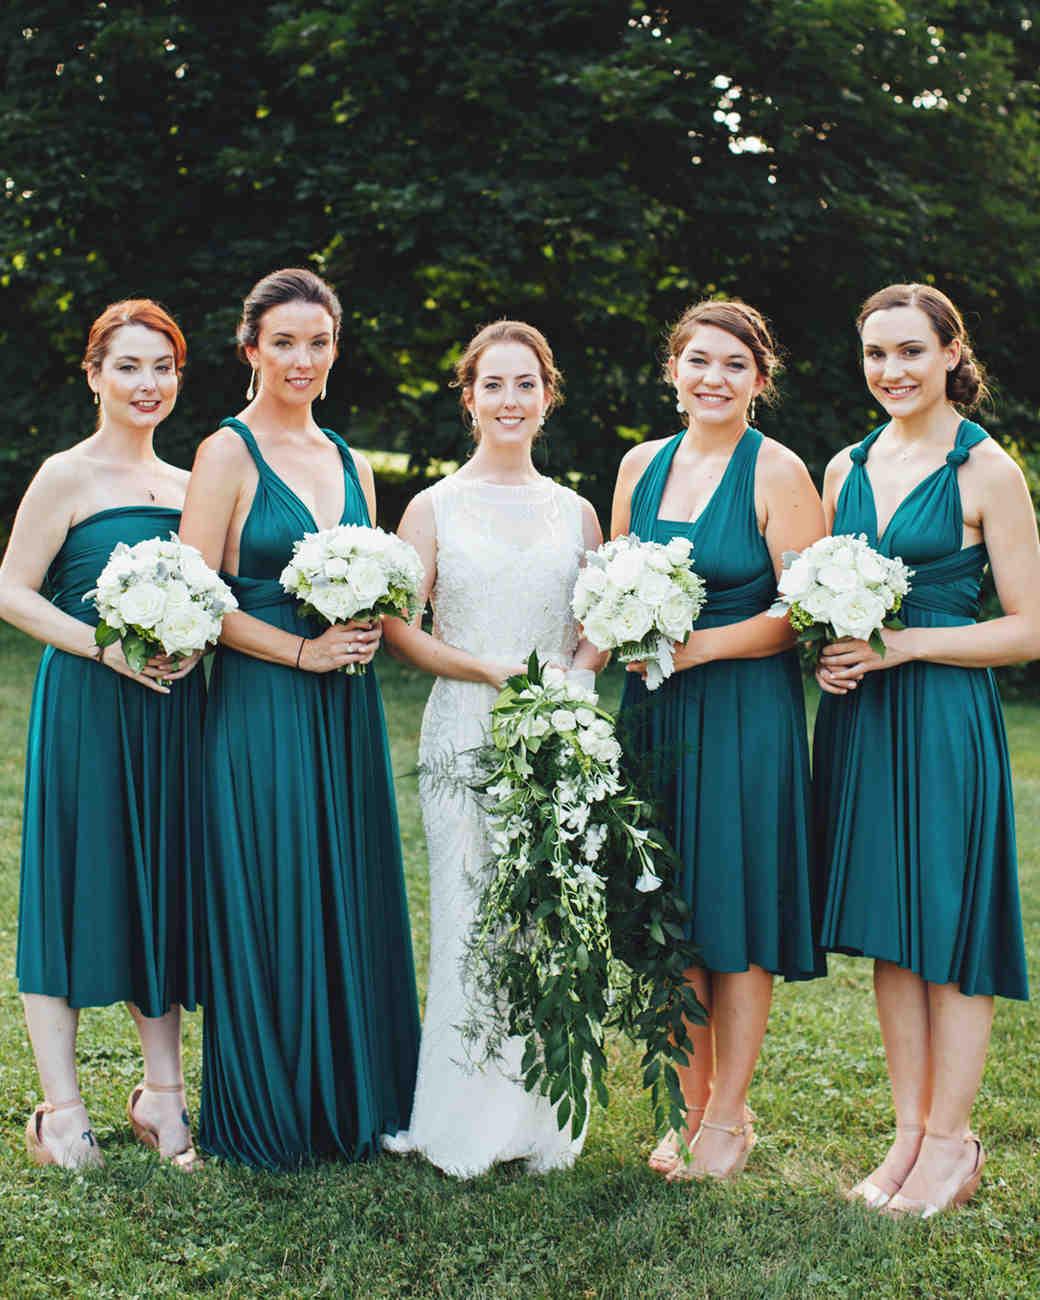 13-teal-bridesmaid-dresses-1015.jpg